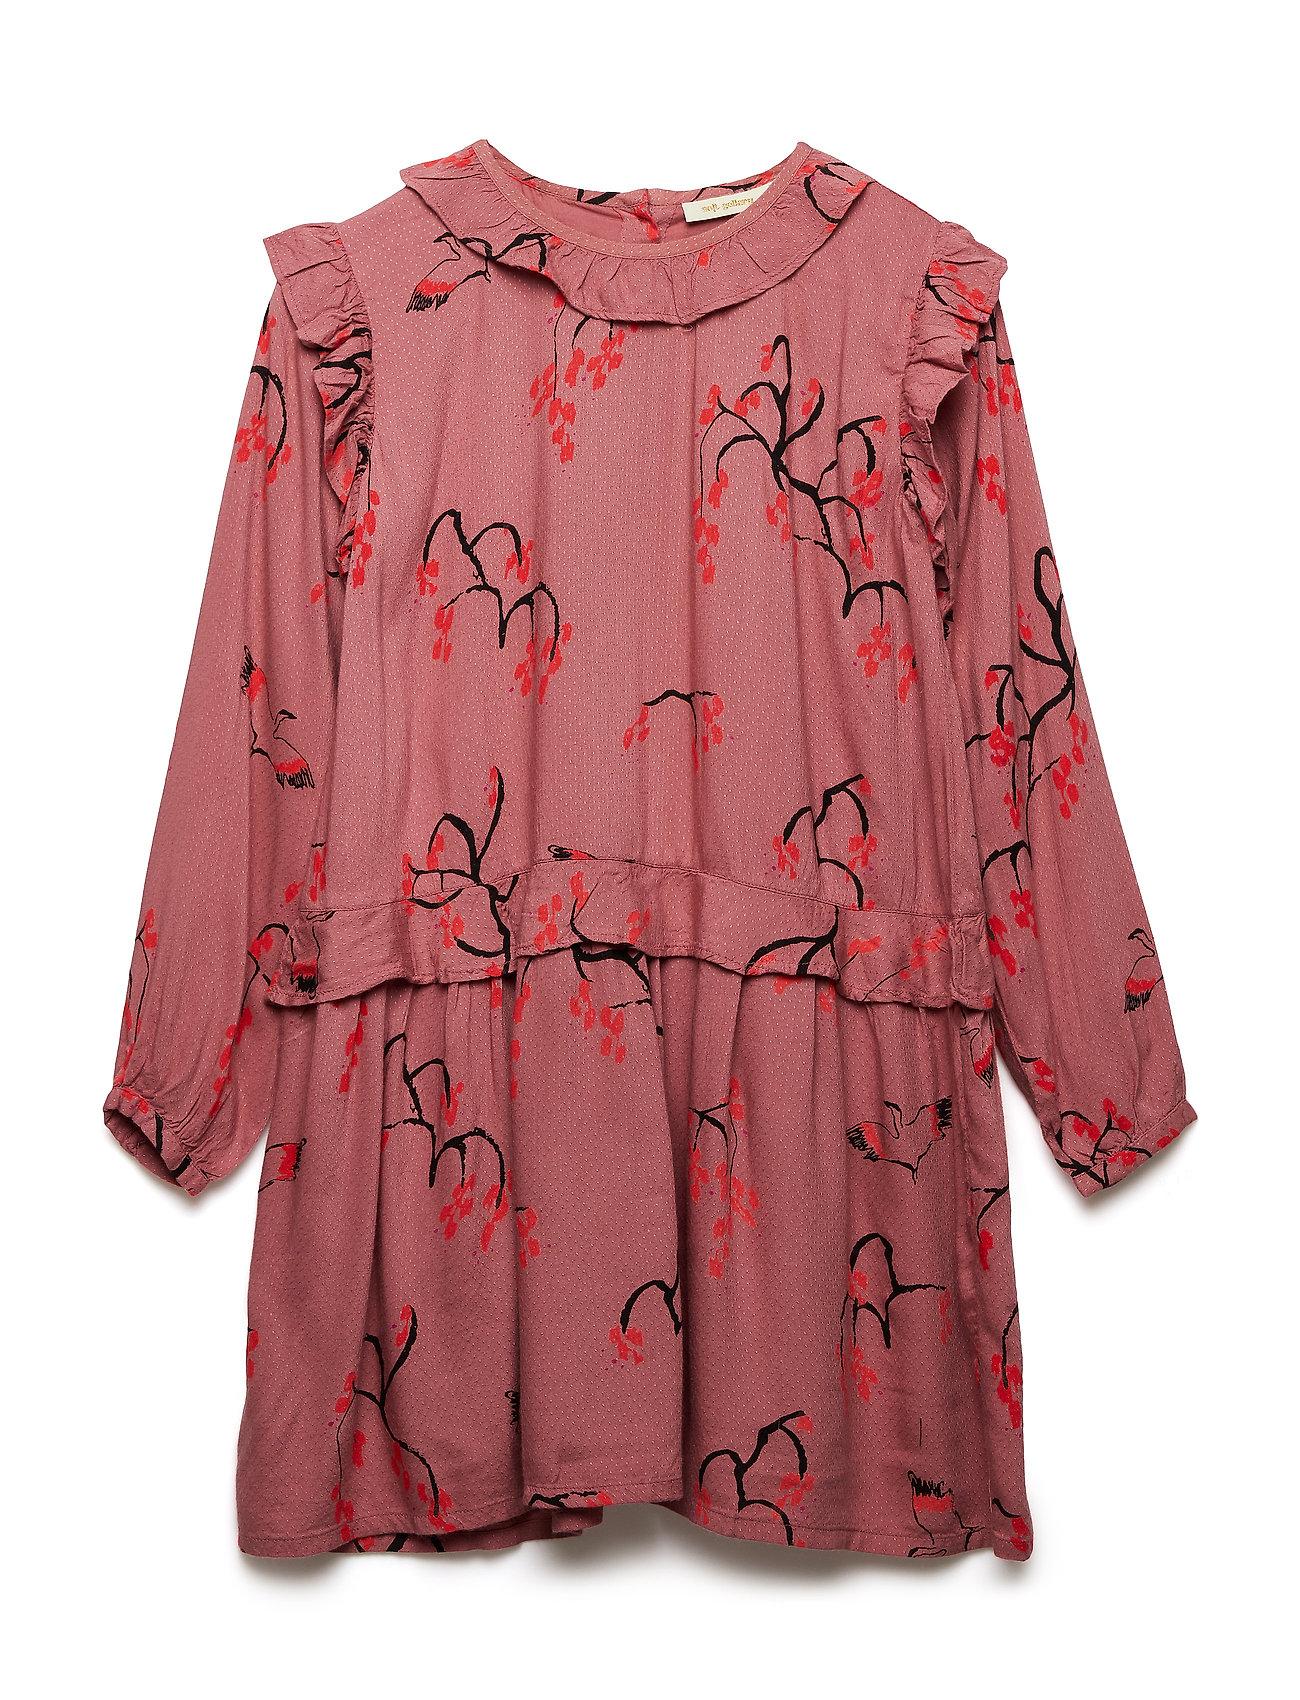 Image of Anemone Dress (3052920187)